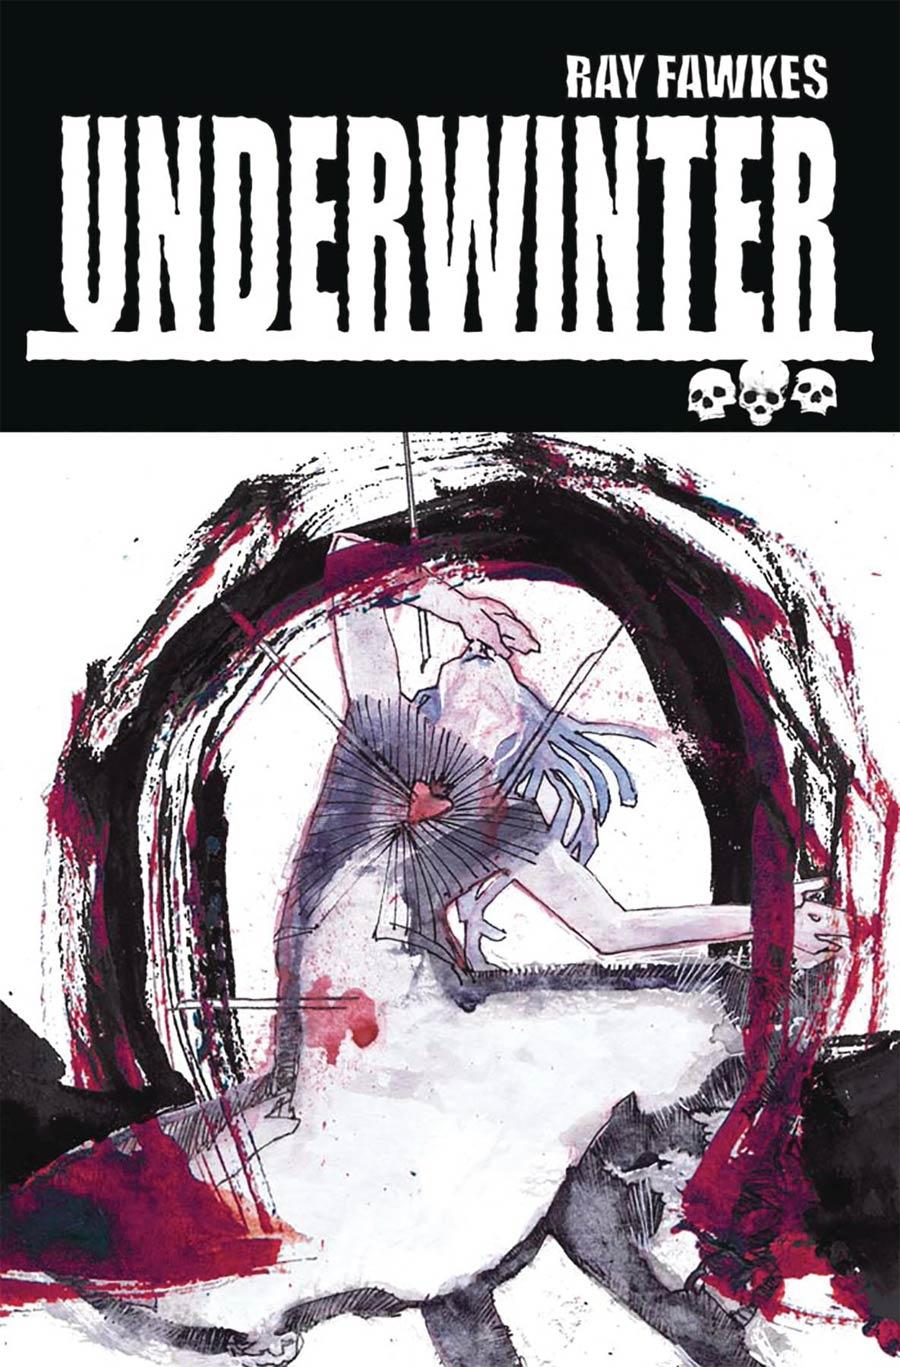 Undercover: 'Underwinter' #6